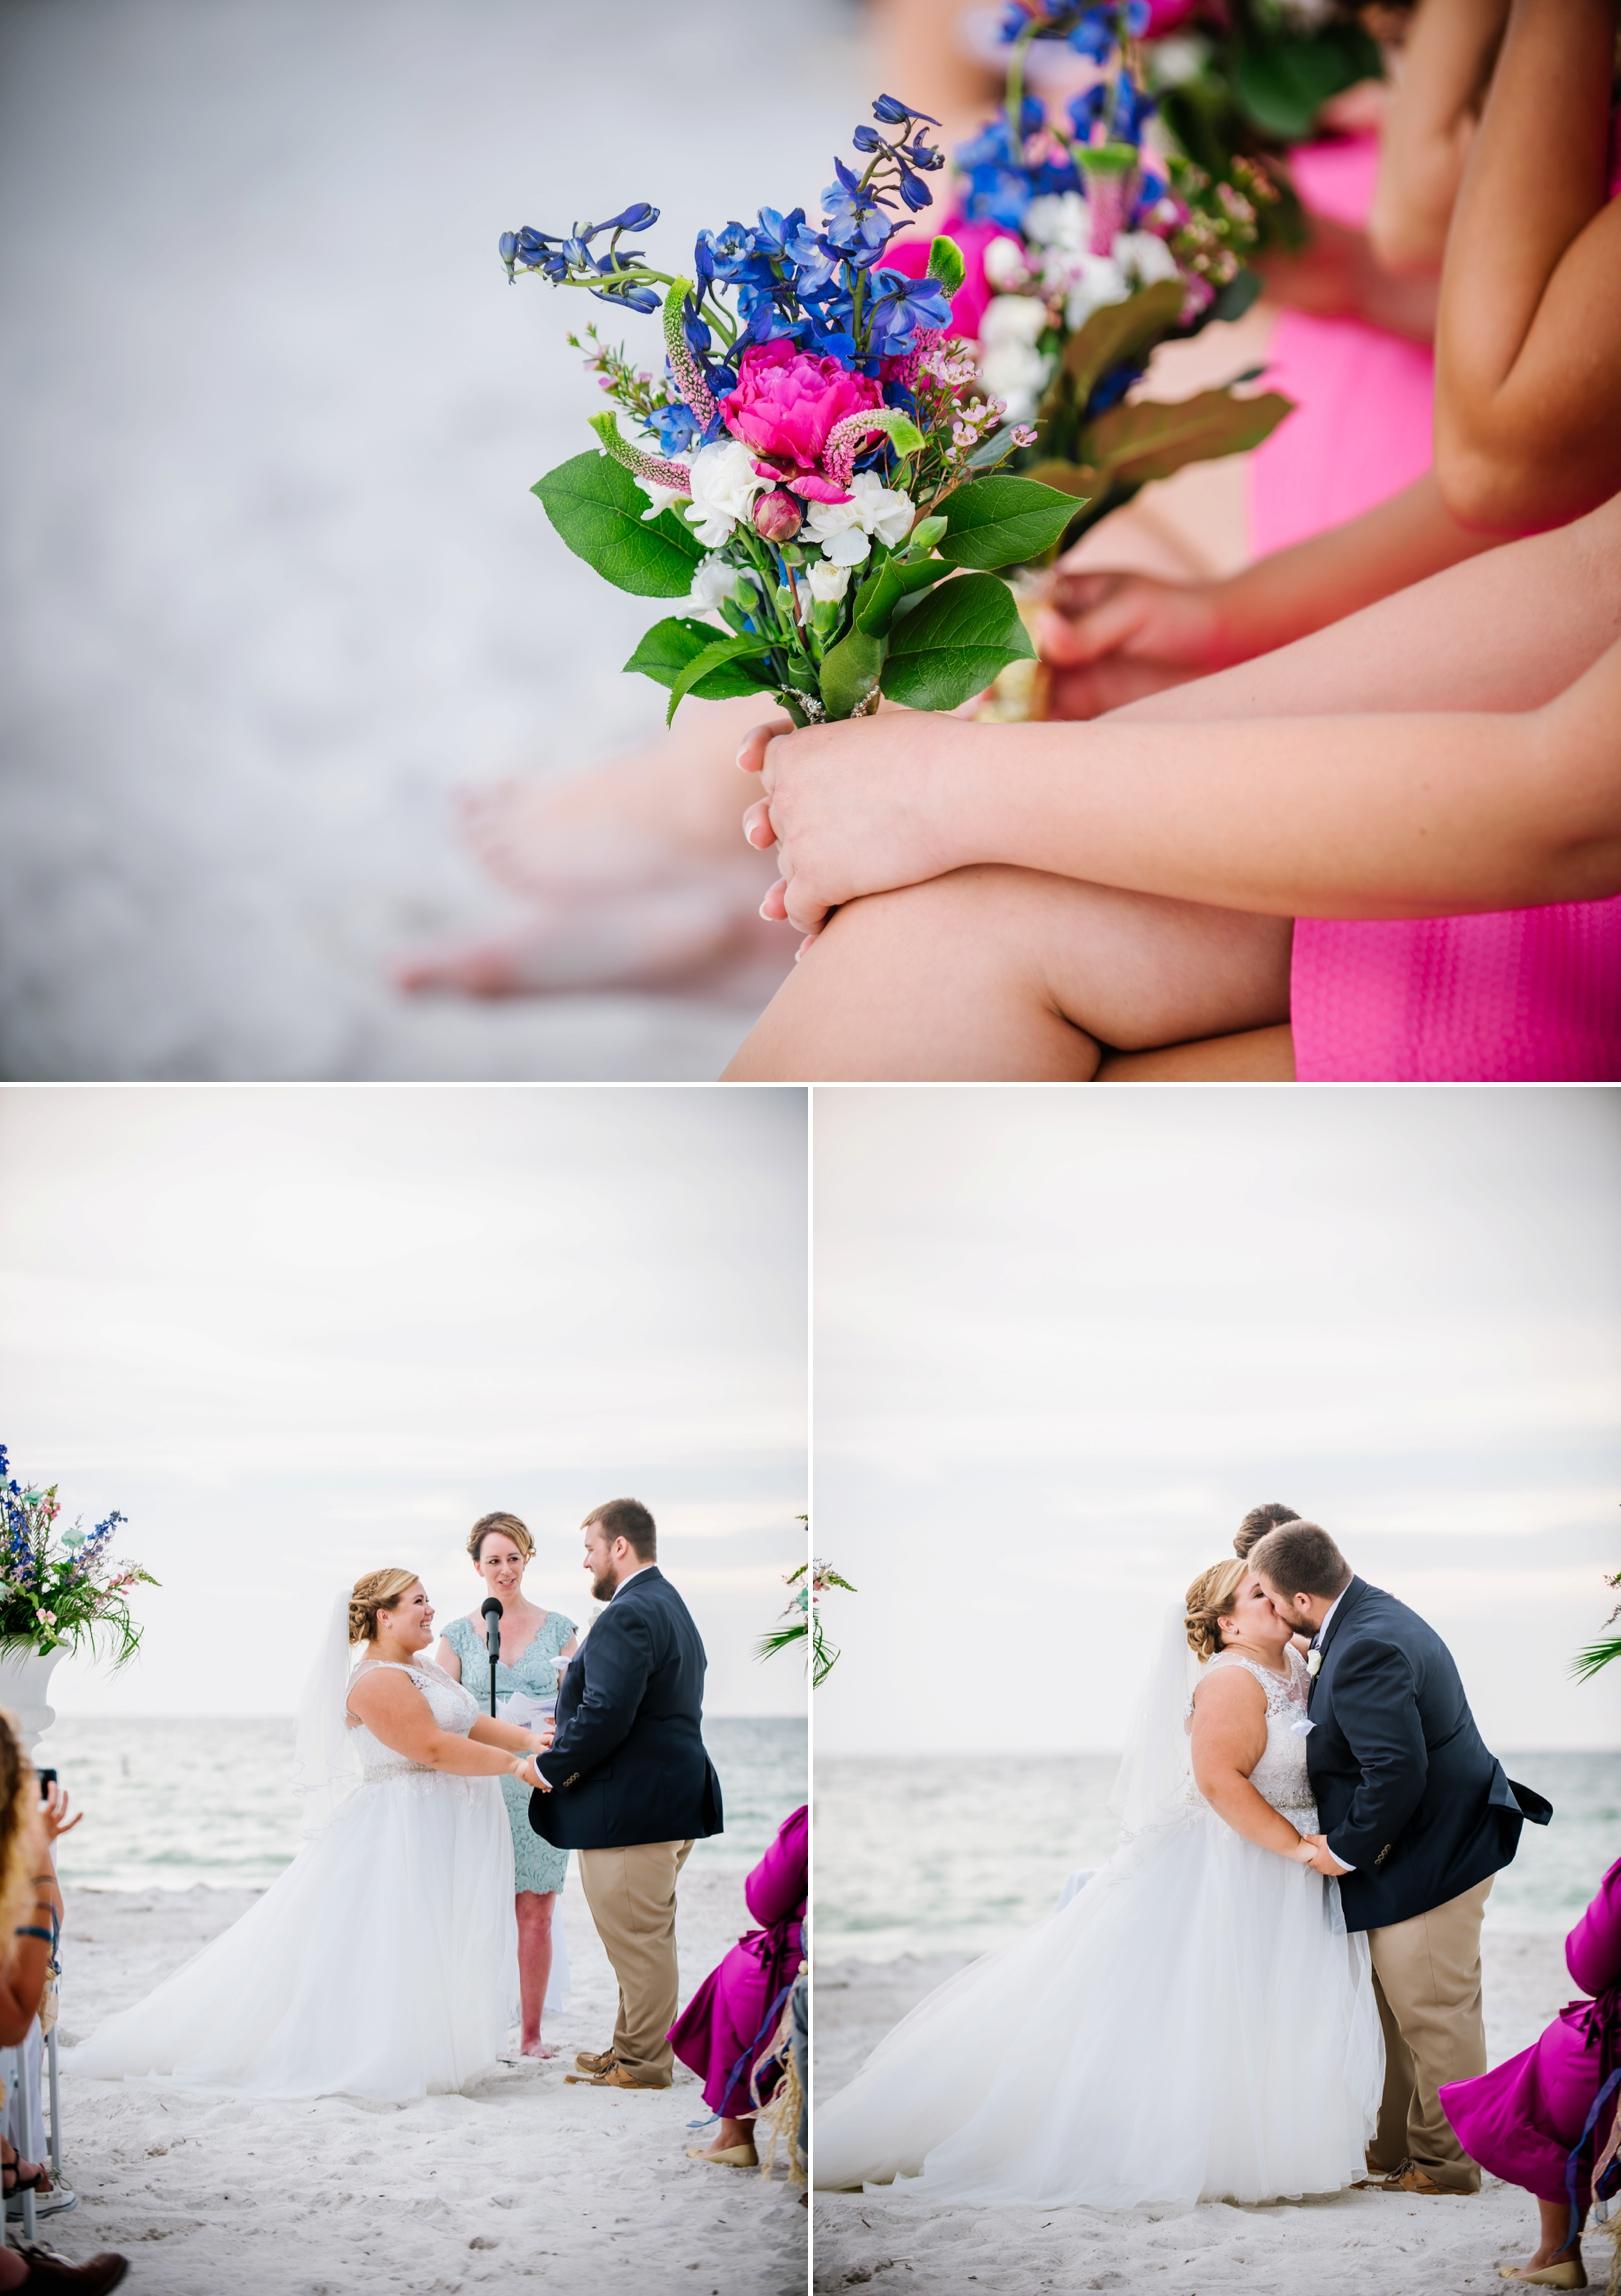 St-pete-wedding-photographer-don-caesar-ashlee-hamon_0017.jpg